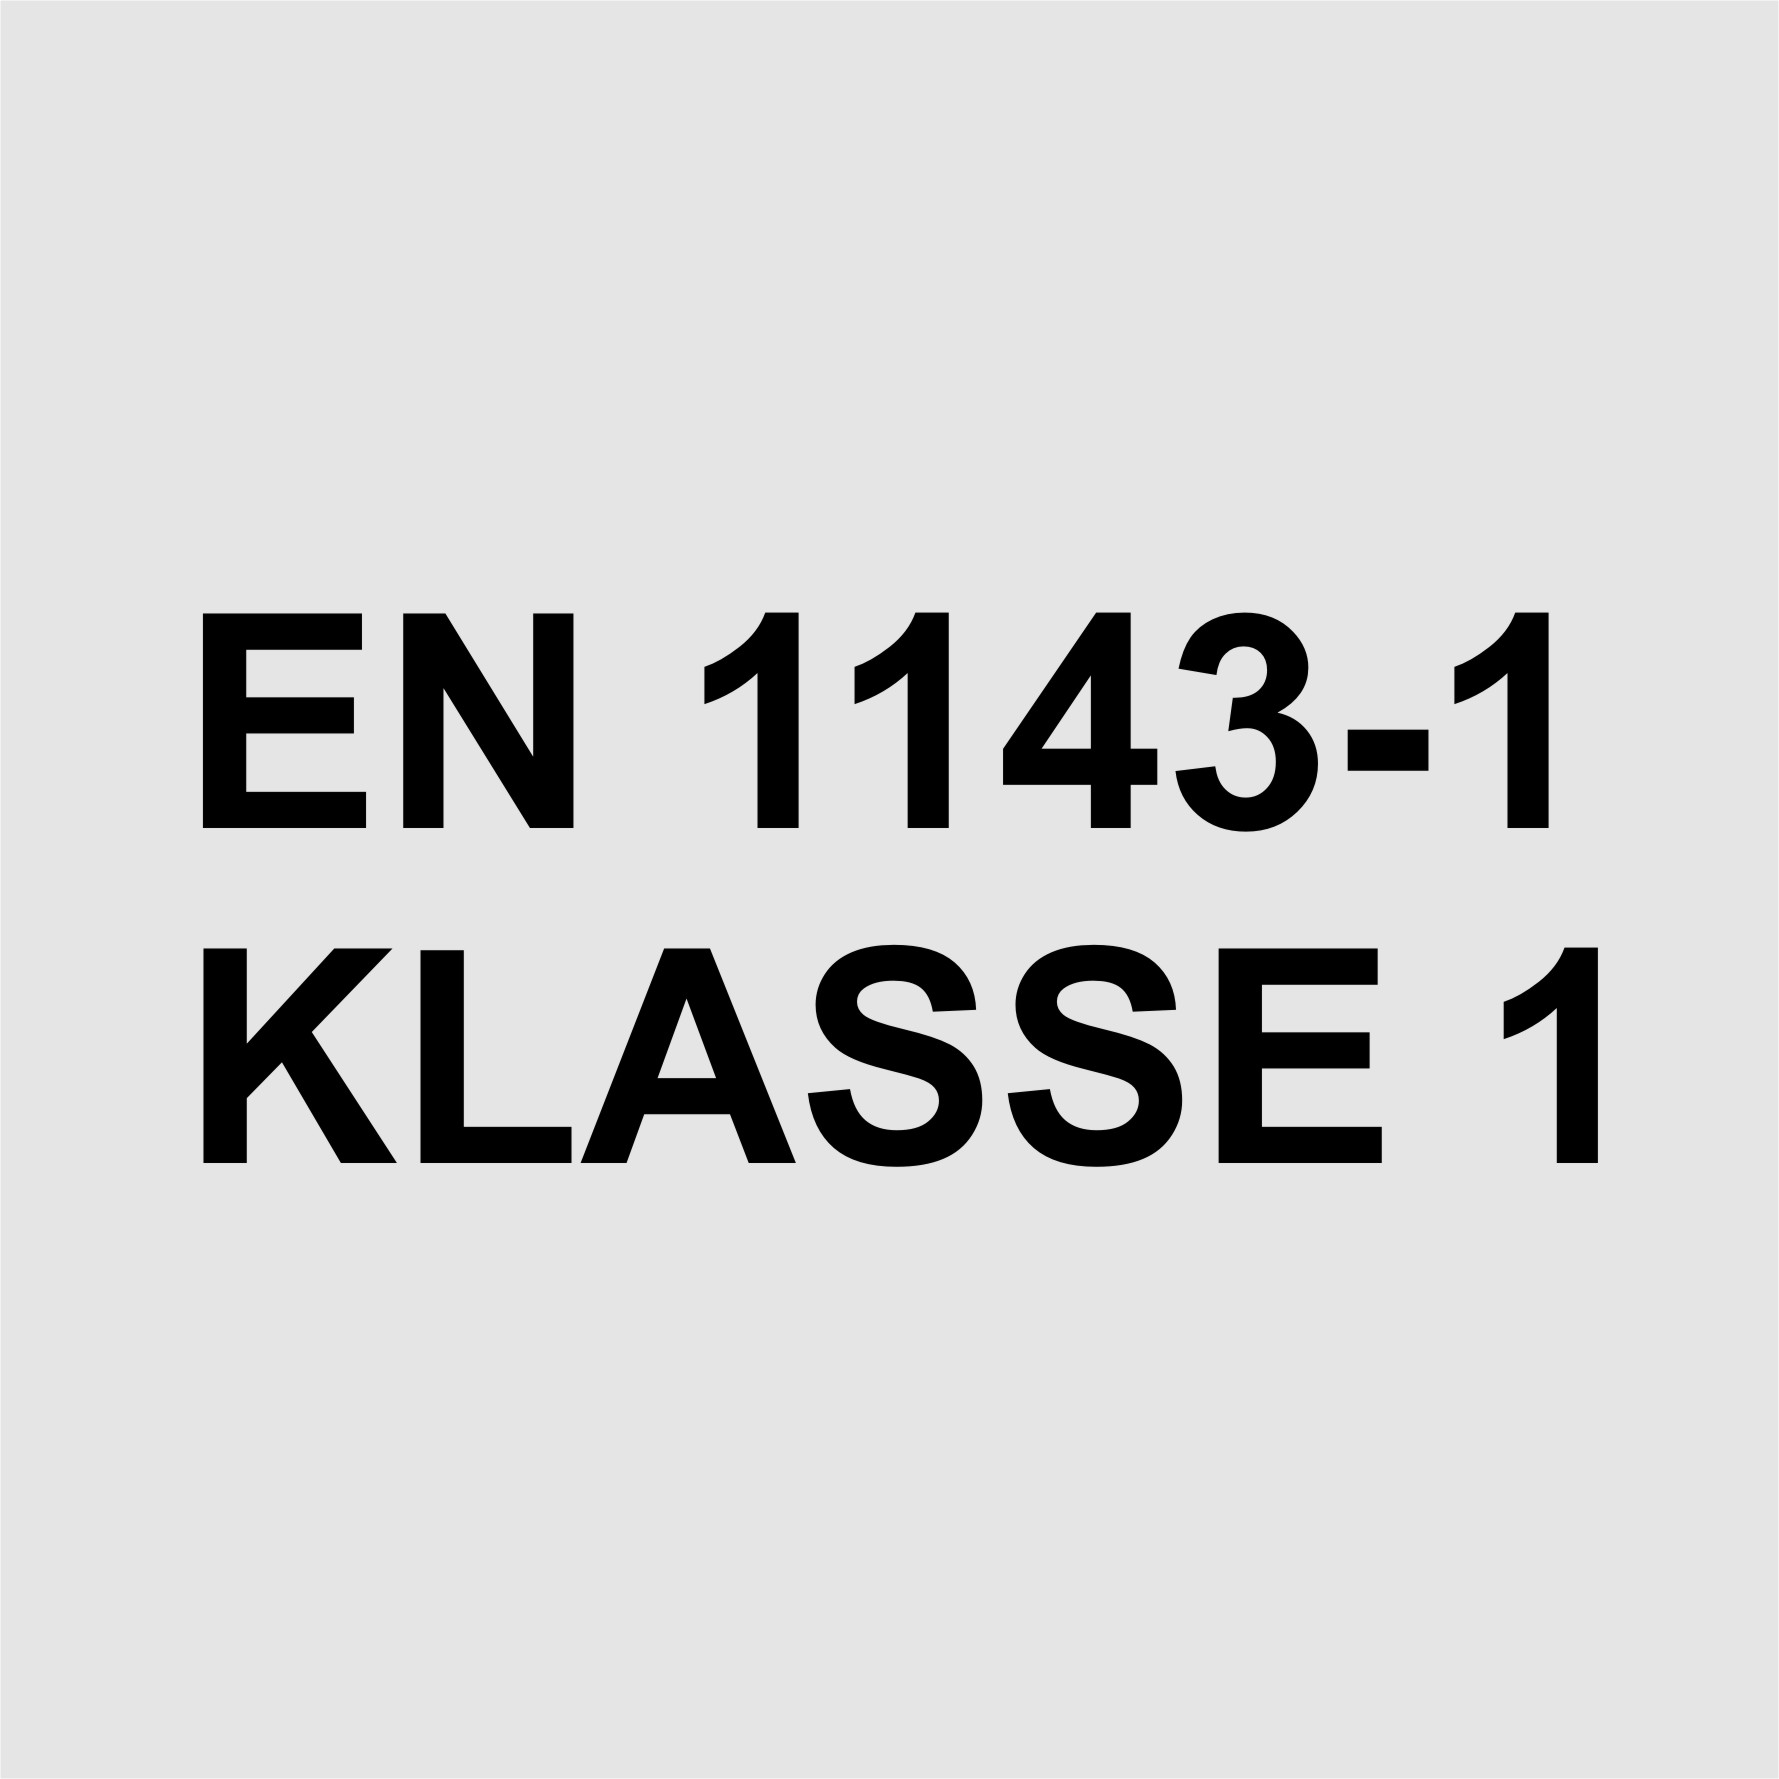 Klasse 1 nach EN 1143-1 + 39,00 Euro 1.363,00 €